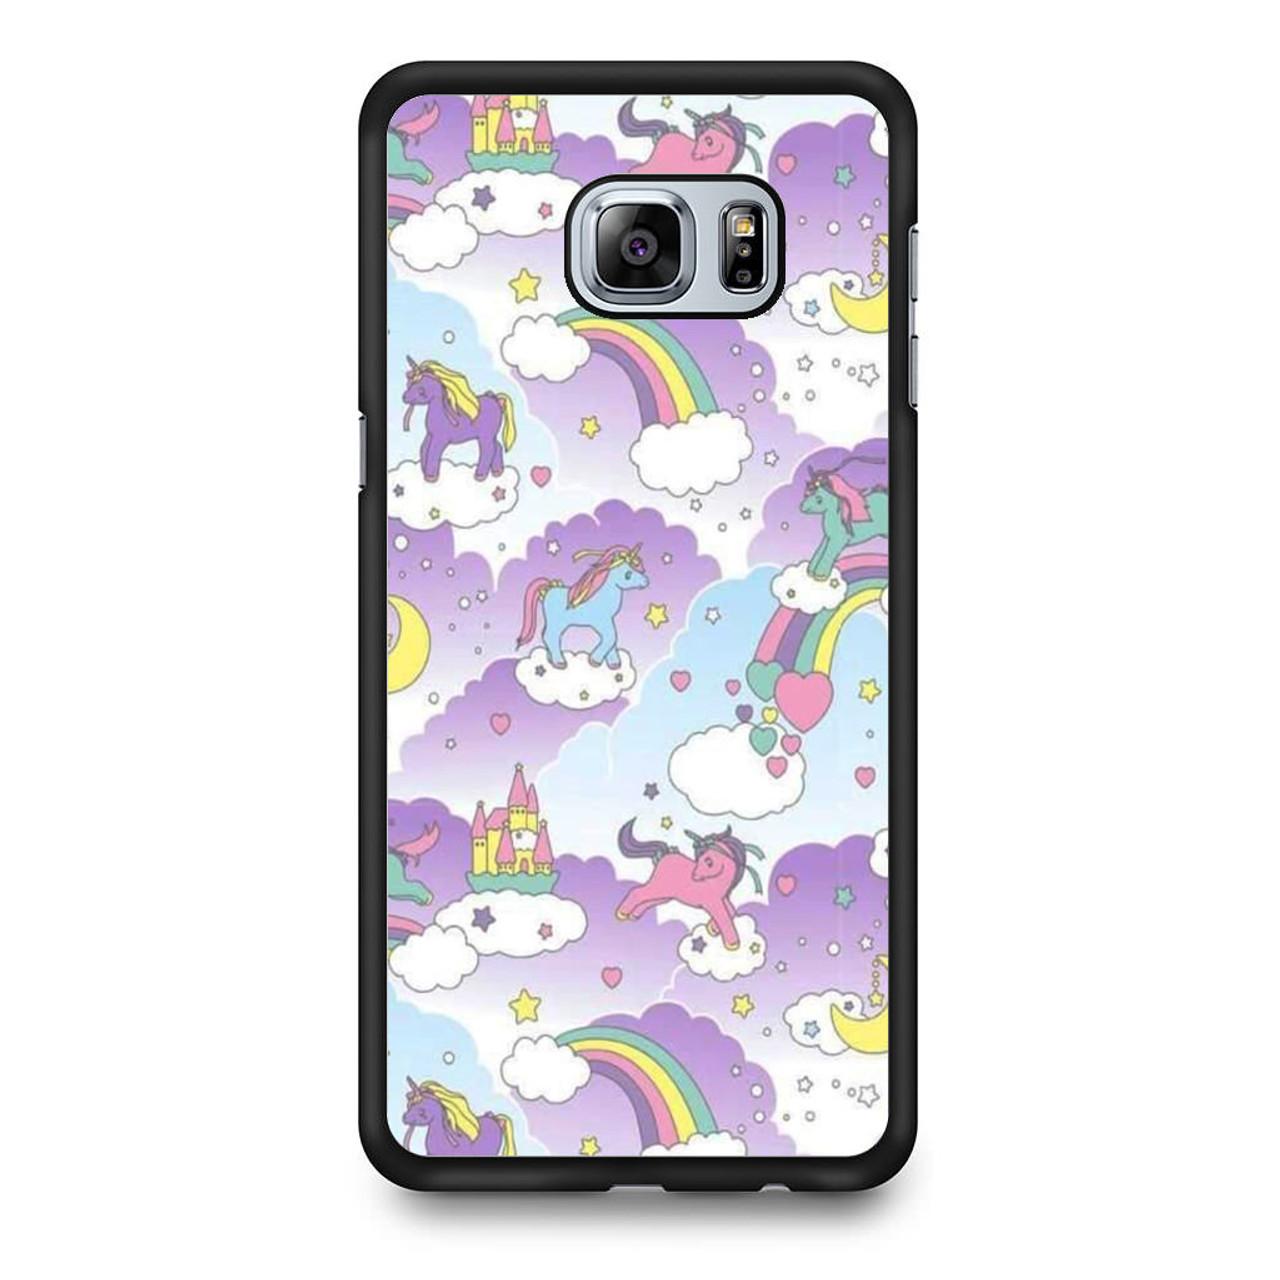 timeless design da1f2 28c32 Unicorn Samsung Galaxy S6 Edge Plus Case